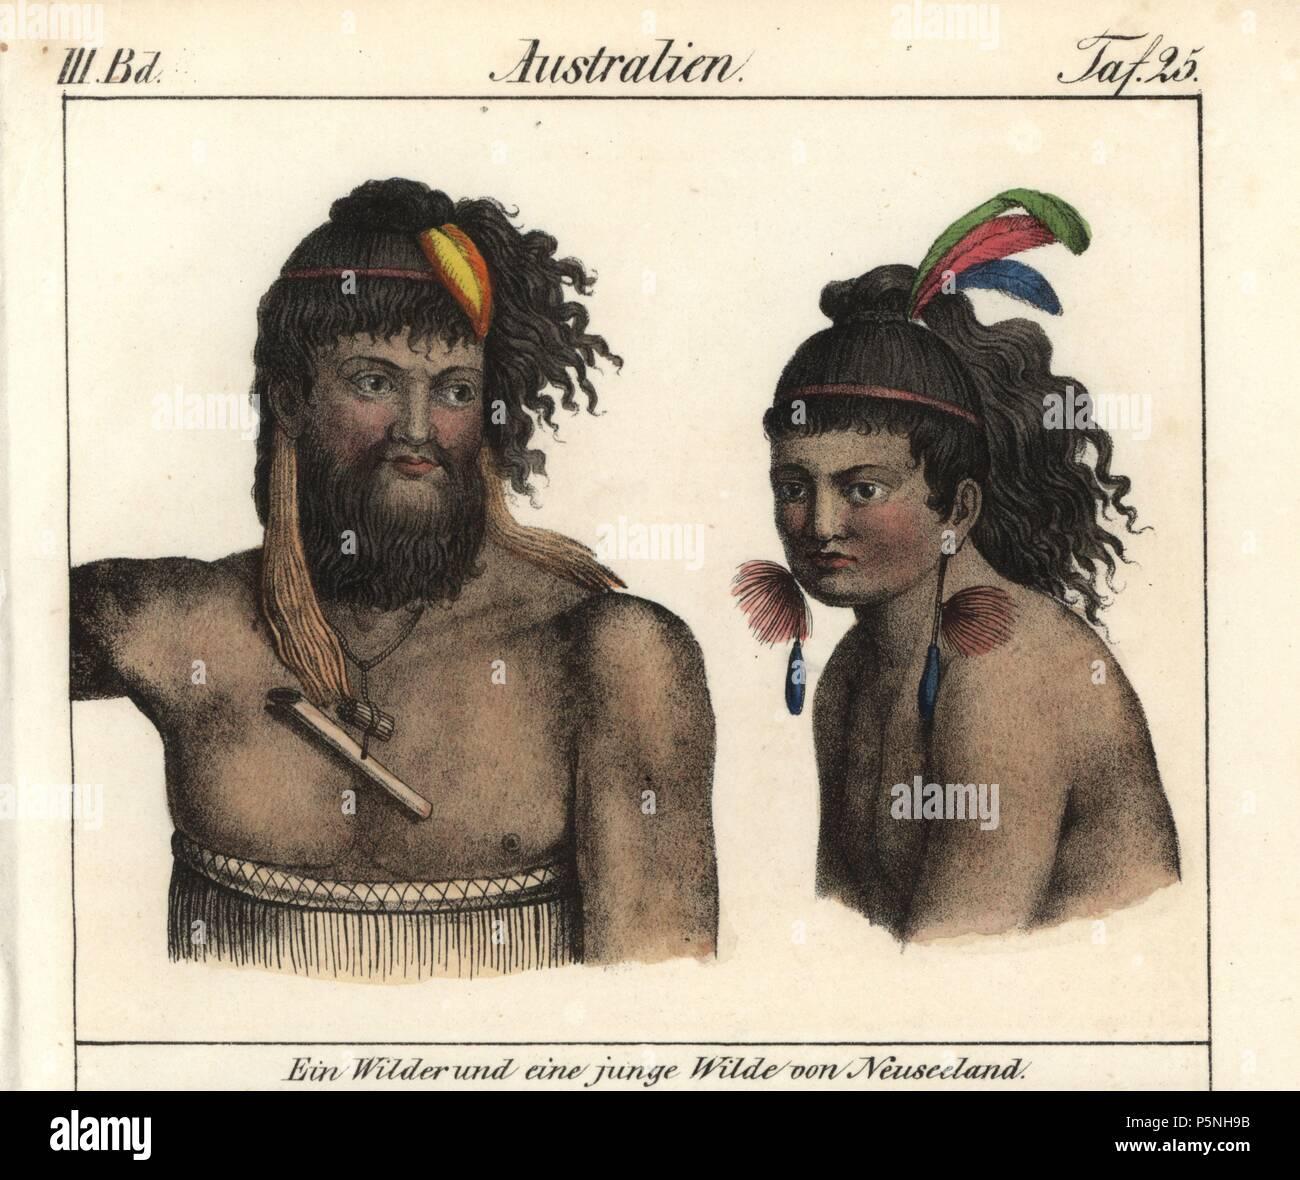 Native Maori men of New Zealand. Handcoloured lithograph from Friedrich Wilhelm Goedsche's 'Vollstaendige Völkergallerie in getreuen Abbildungen' (Complete Gallery of Peoples in True Pictures), Meissen, circa 1835-1840. Goedsche (1785-1863) was a German writer, bookseller and publisher in Meissen. - Stock Image